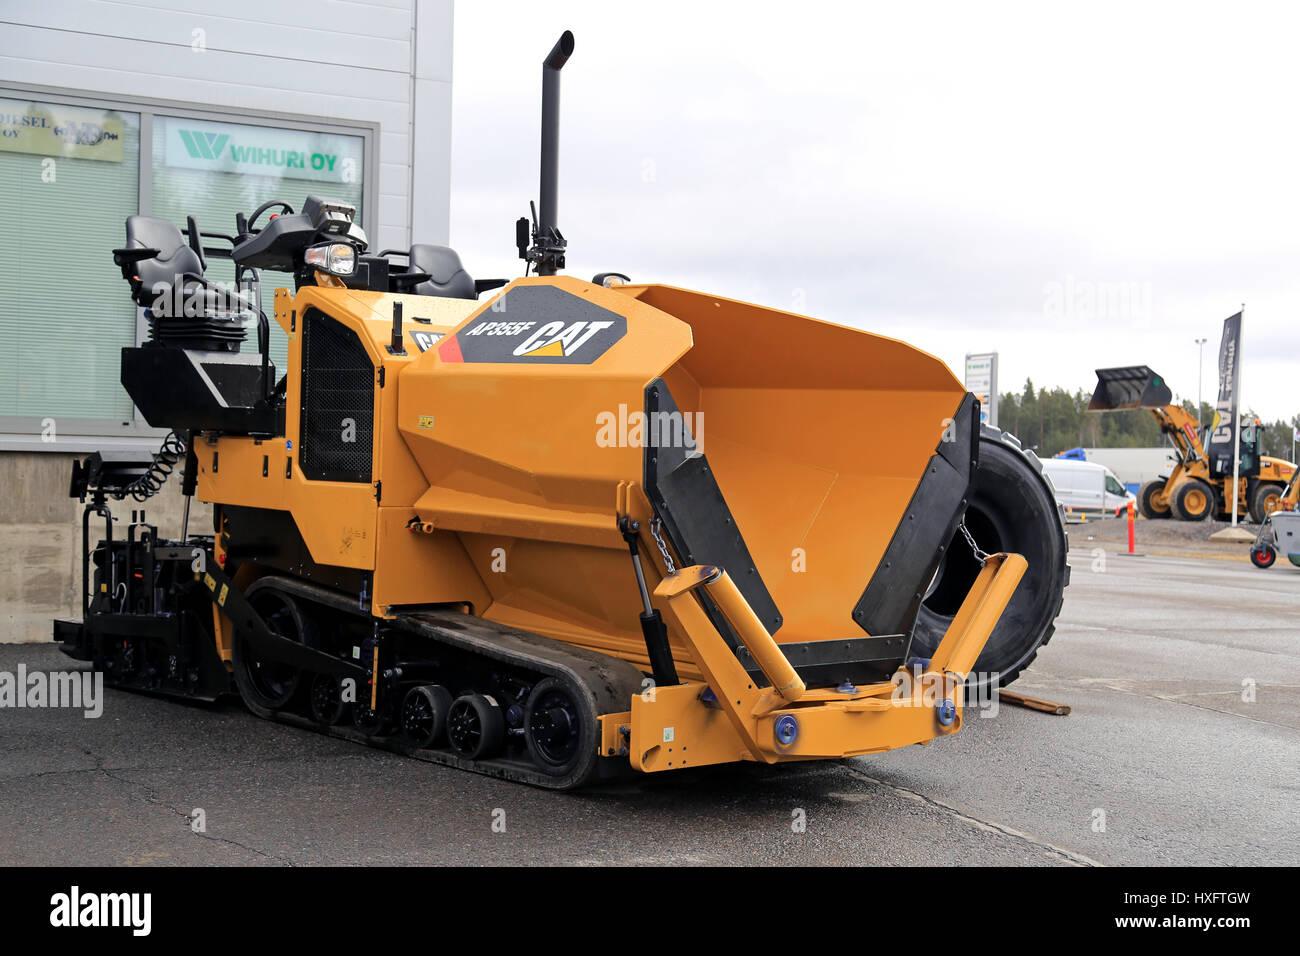 LIETO FINLAND - MARCH 25 2017: Cat AP355F asphalt paver seen at the Stock Photo: 136802201 - Alamy